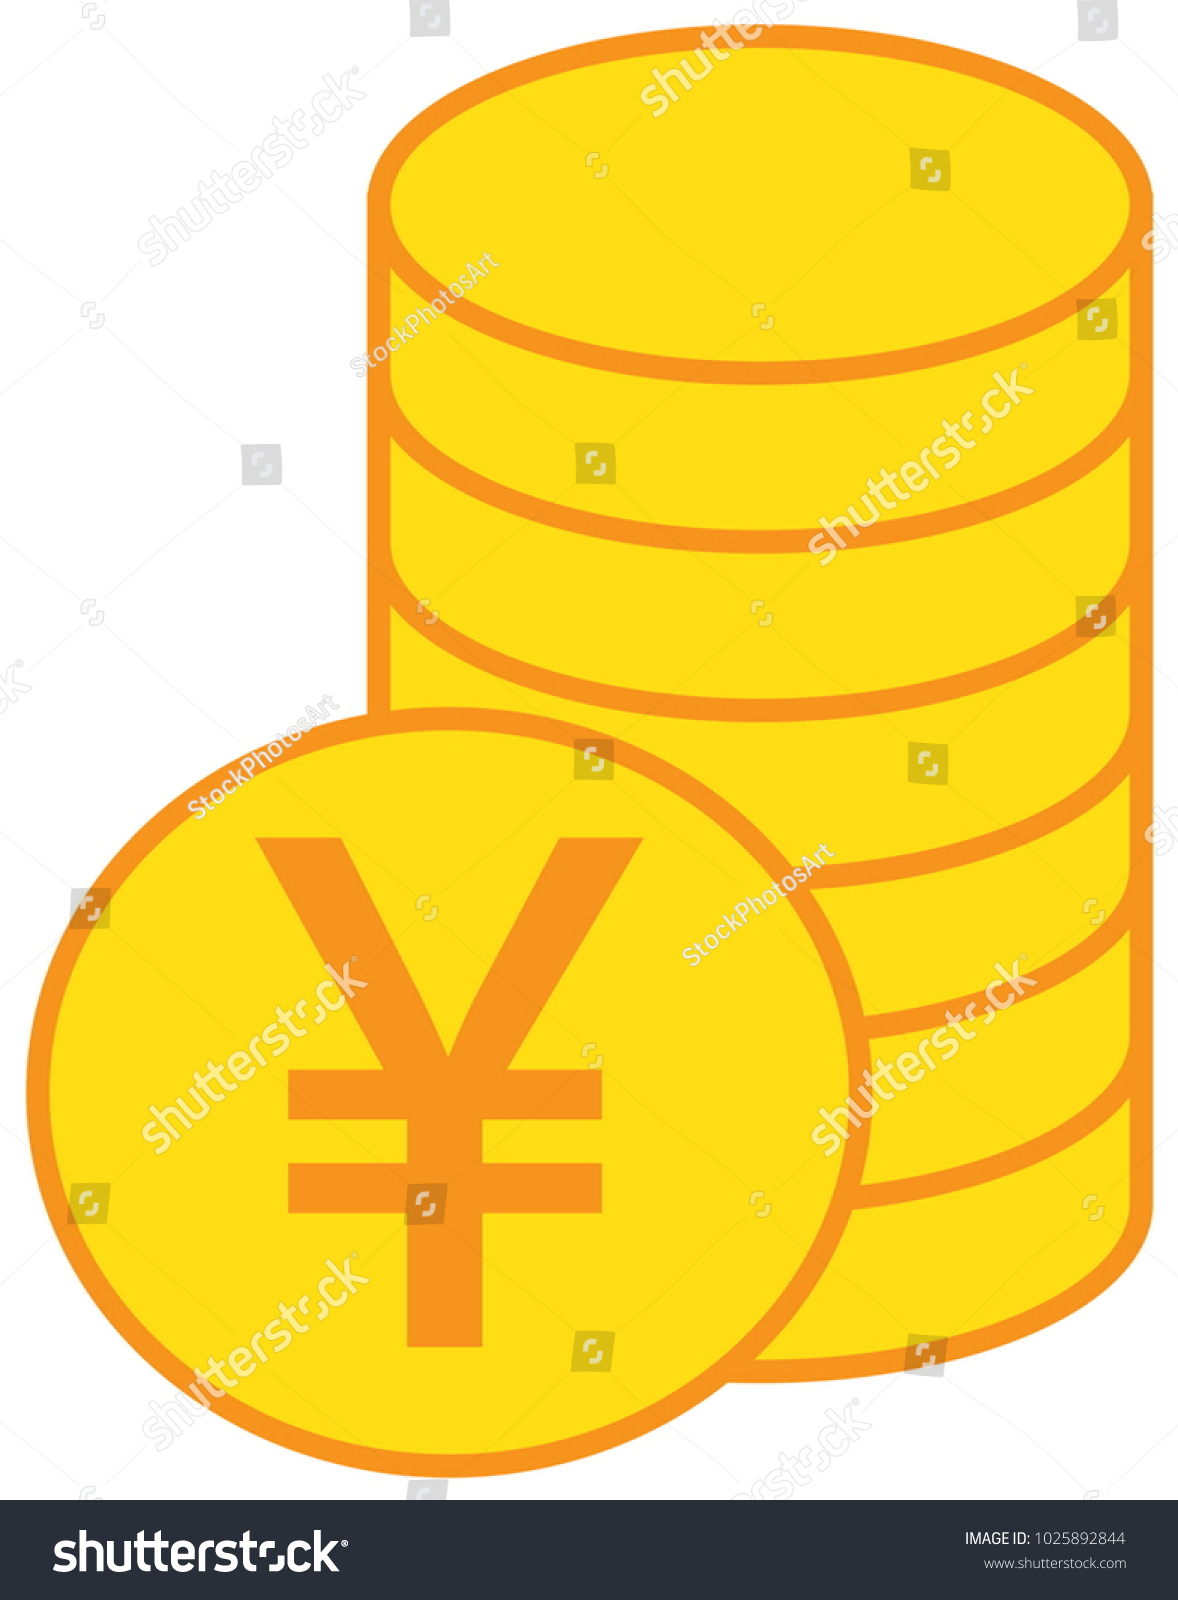 Yen Yuan Renminbi Currency Icon Logo Stock Vector 1025892844